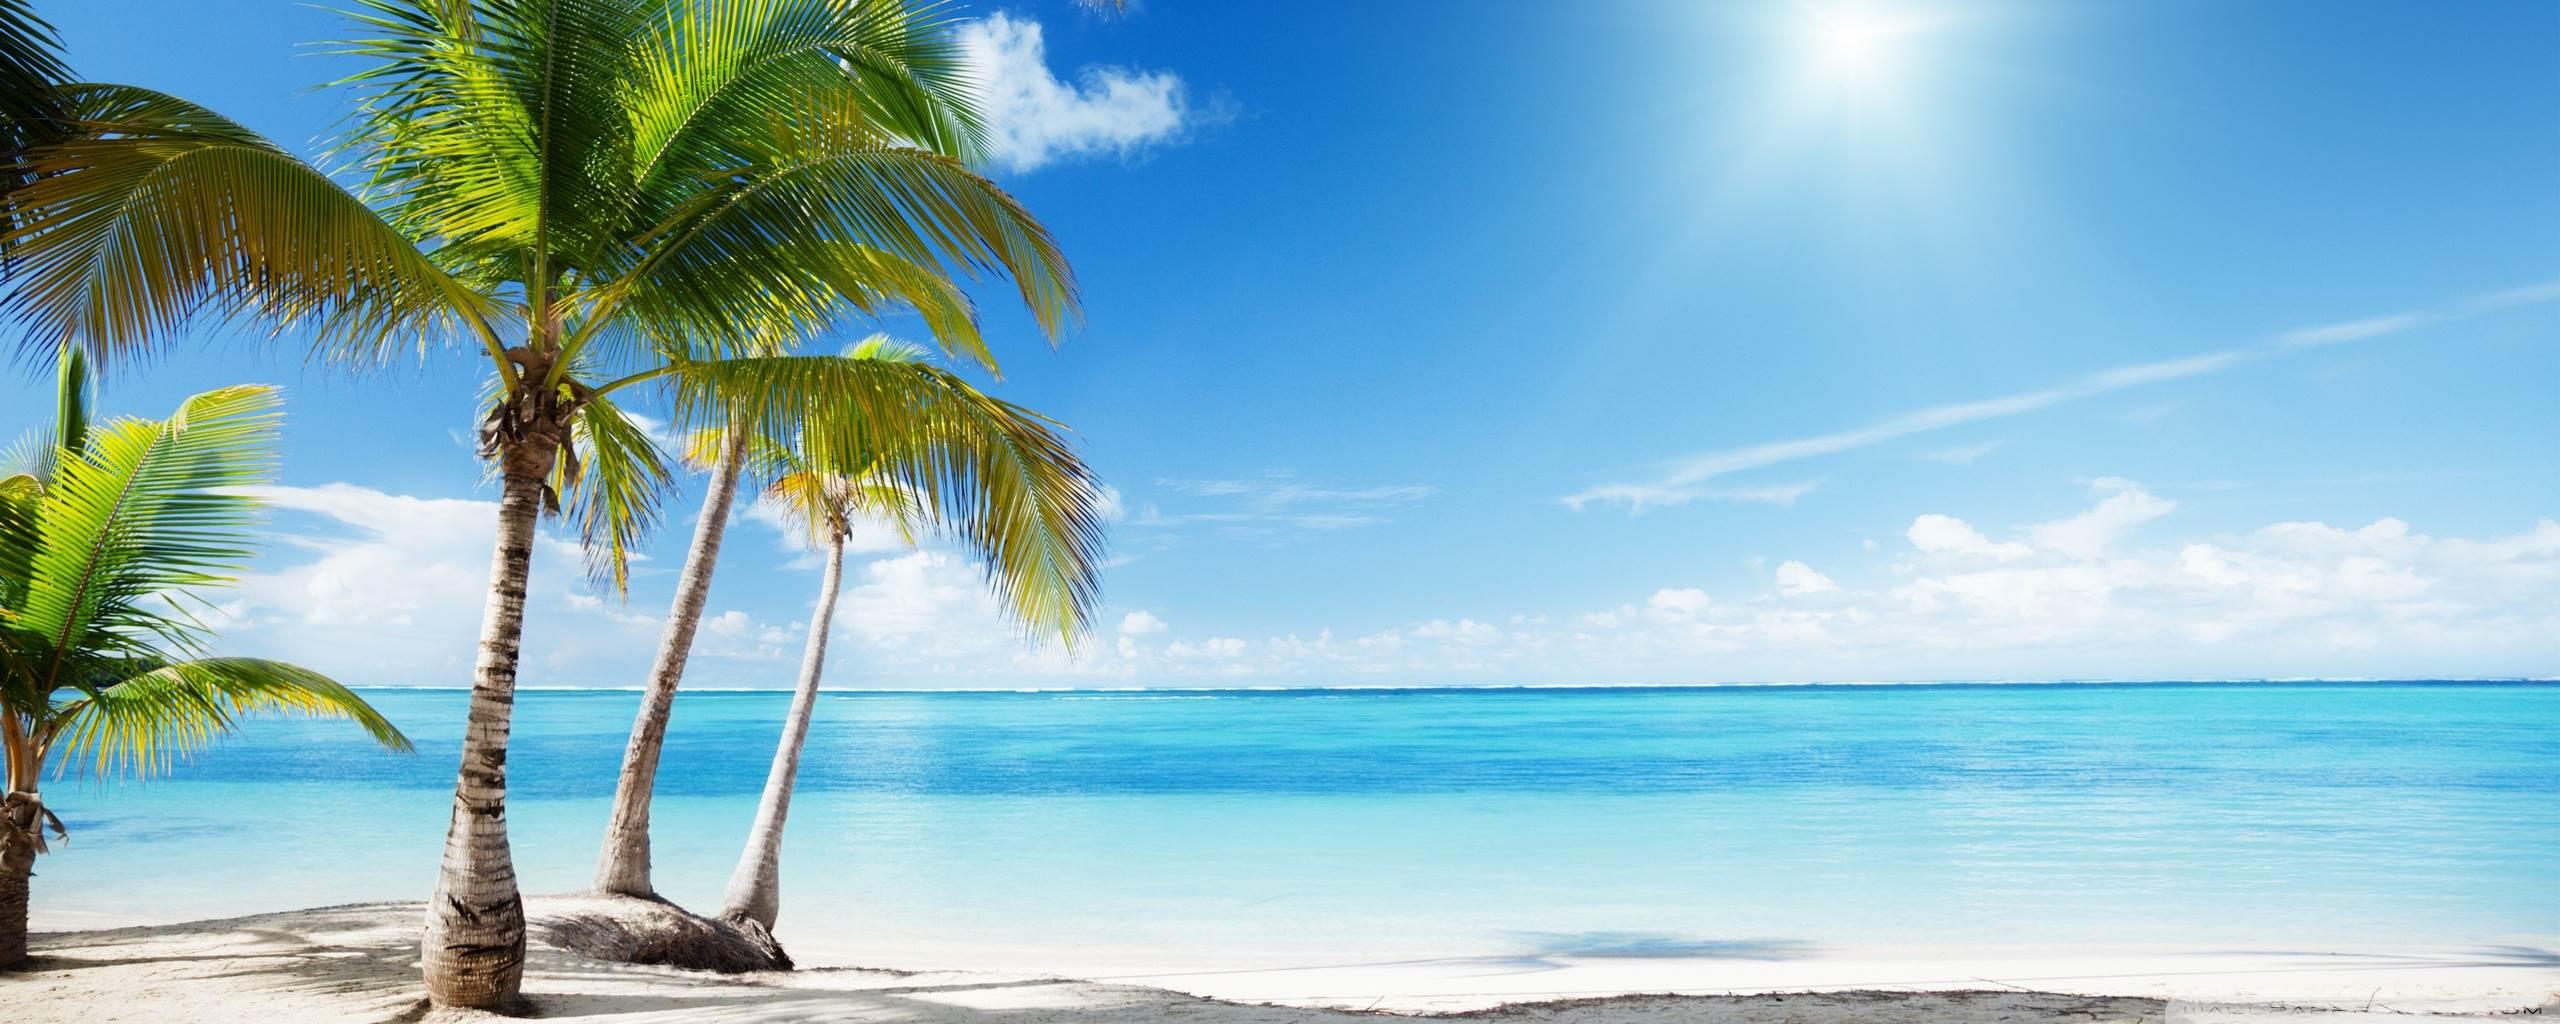 Tropical Beach Paradise Hd Desktop Wallpaper Tropical